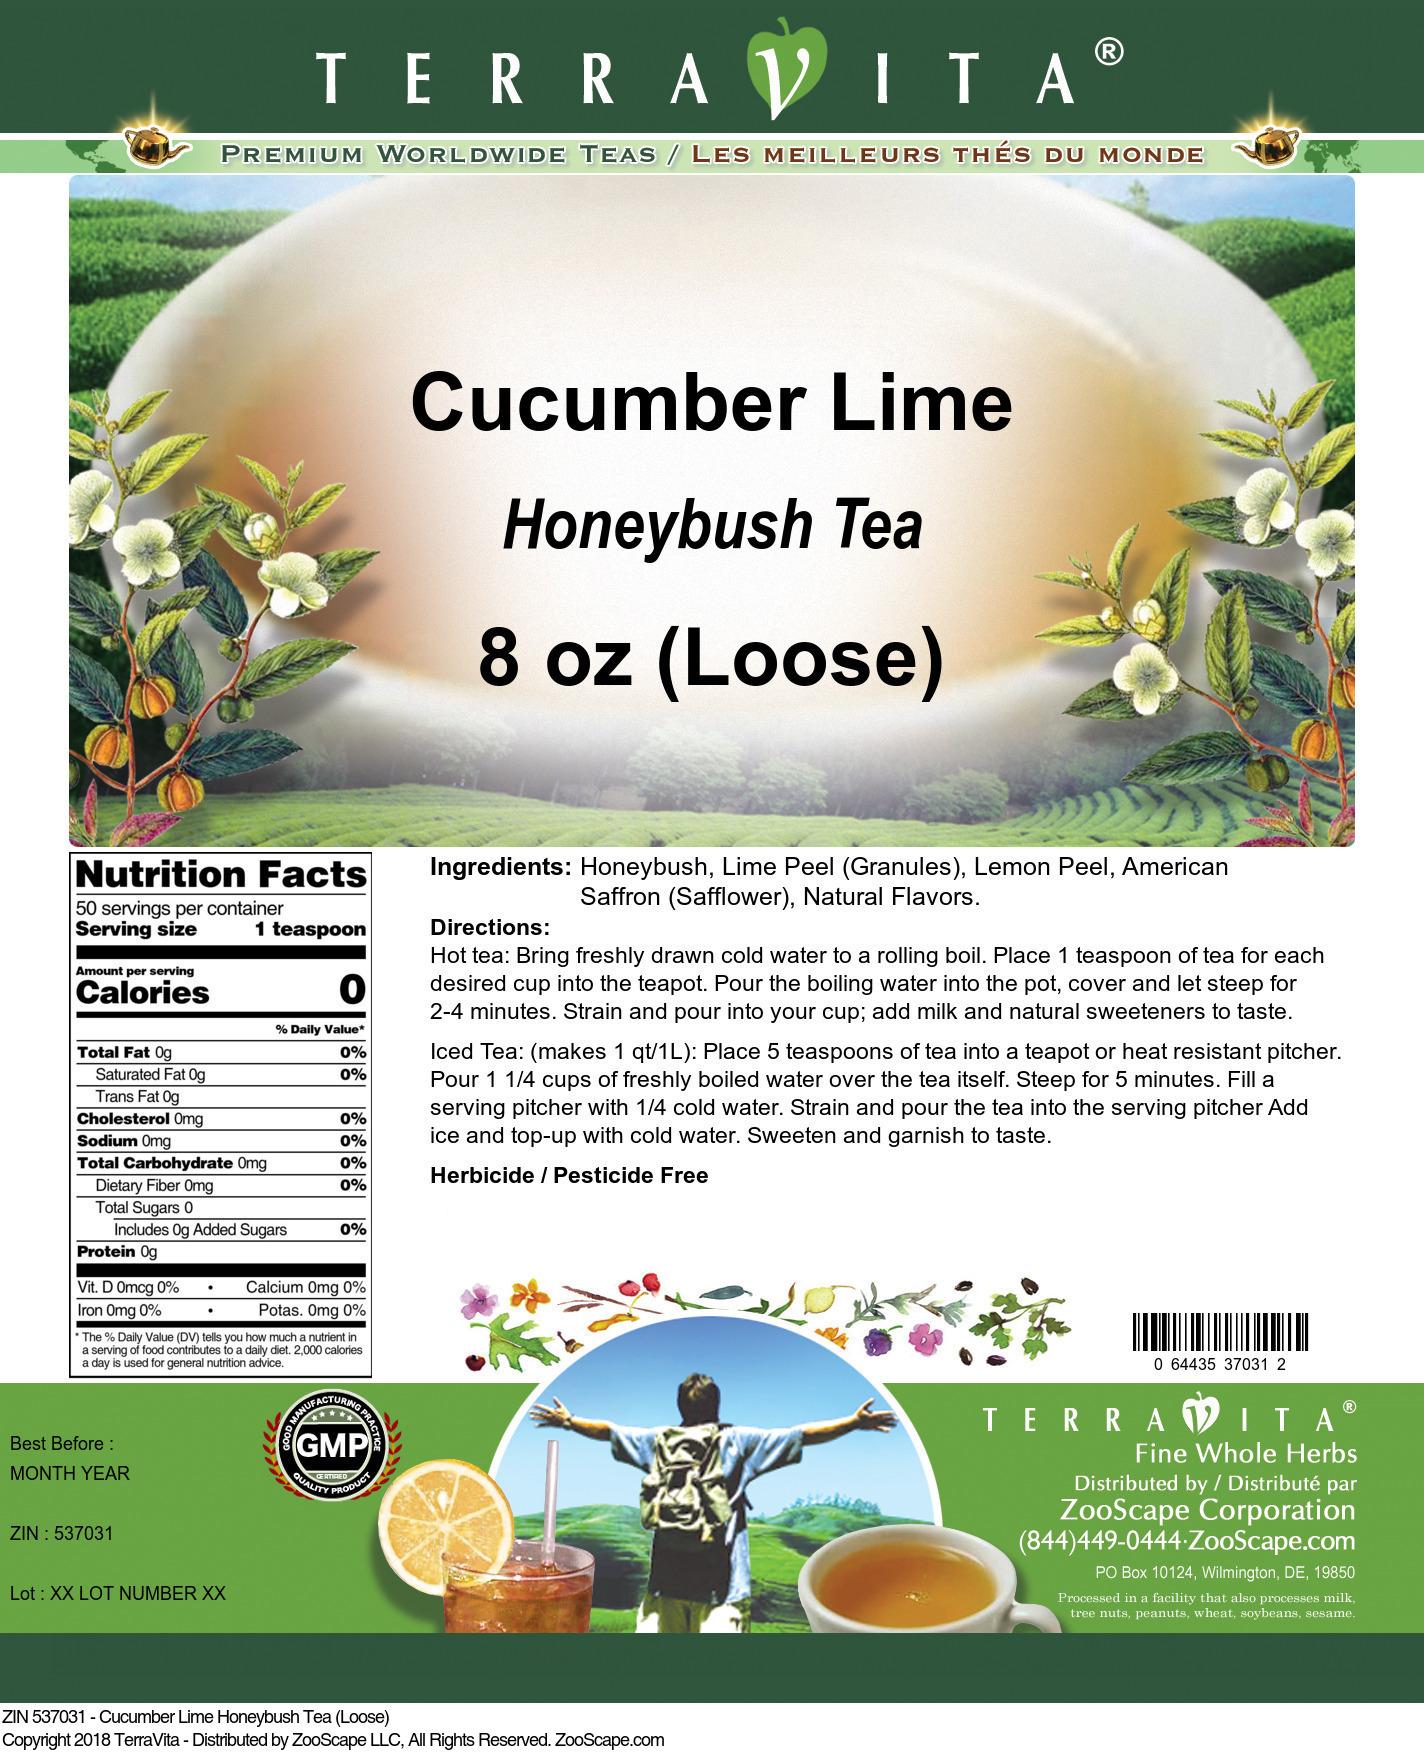 Cucumber Lime Honeybush Tea